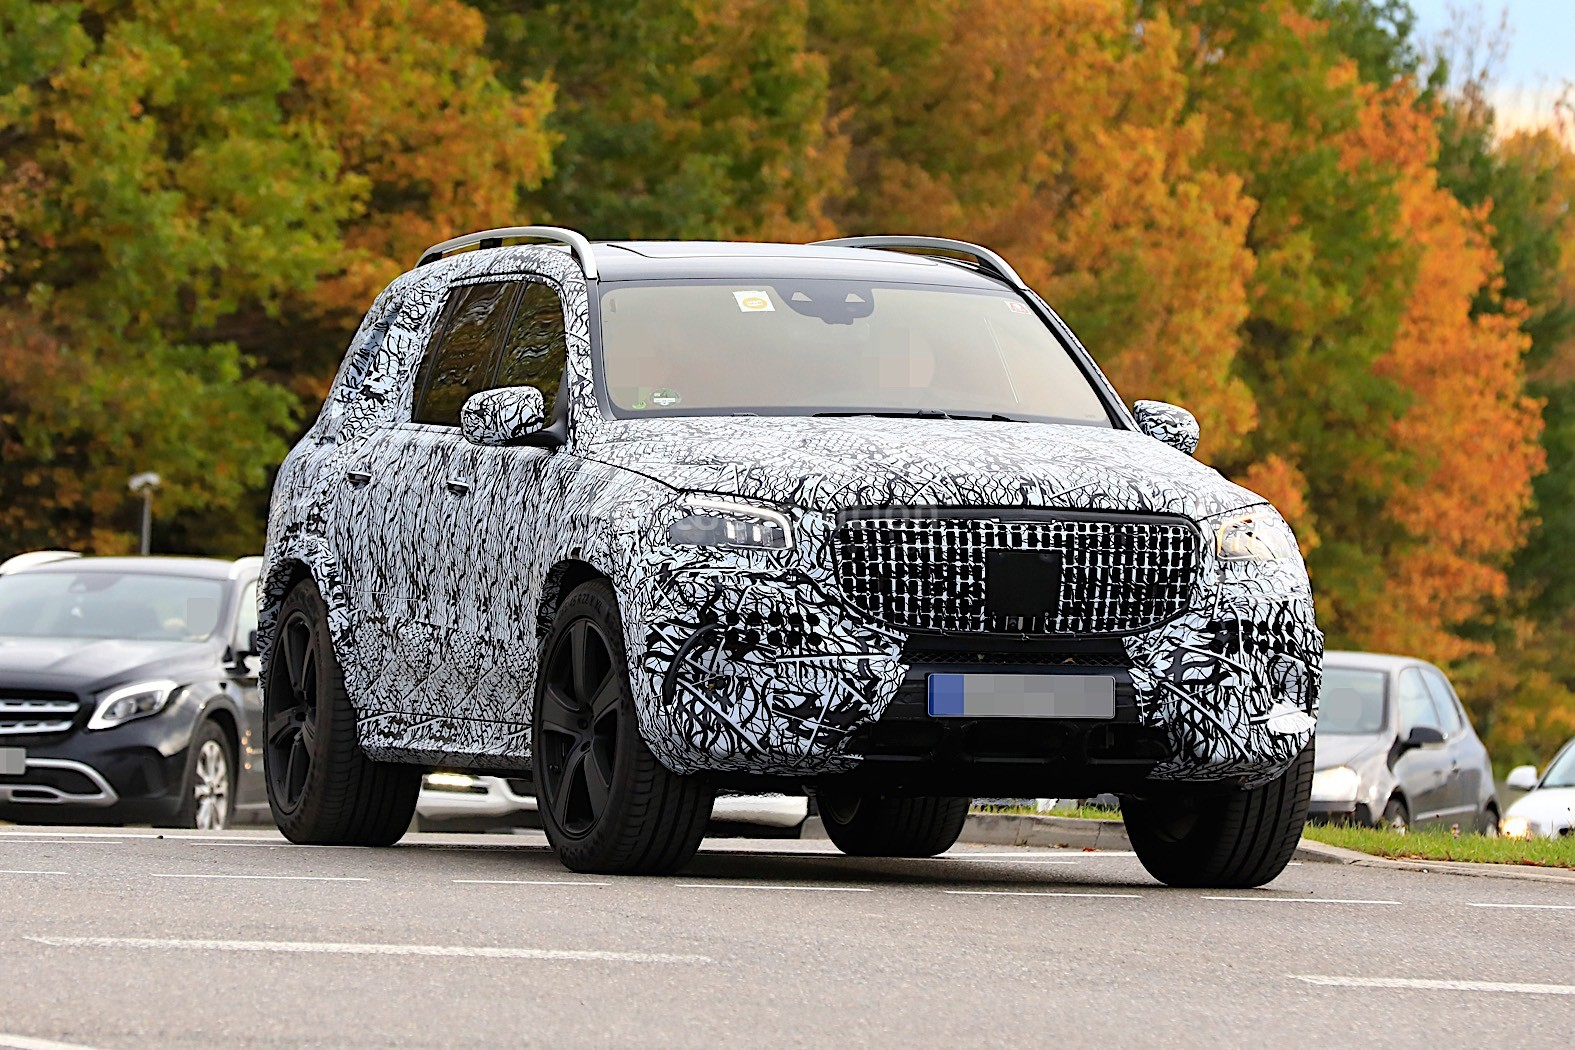 New Mercedes Suv >> 2020 Mercedes-Maybach GLS Meets Mercedes-Benz GLS in Rare ...